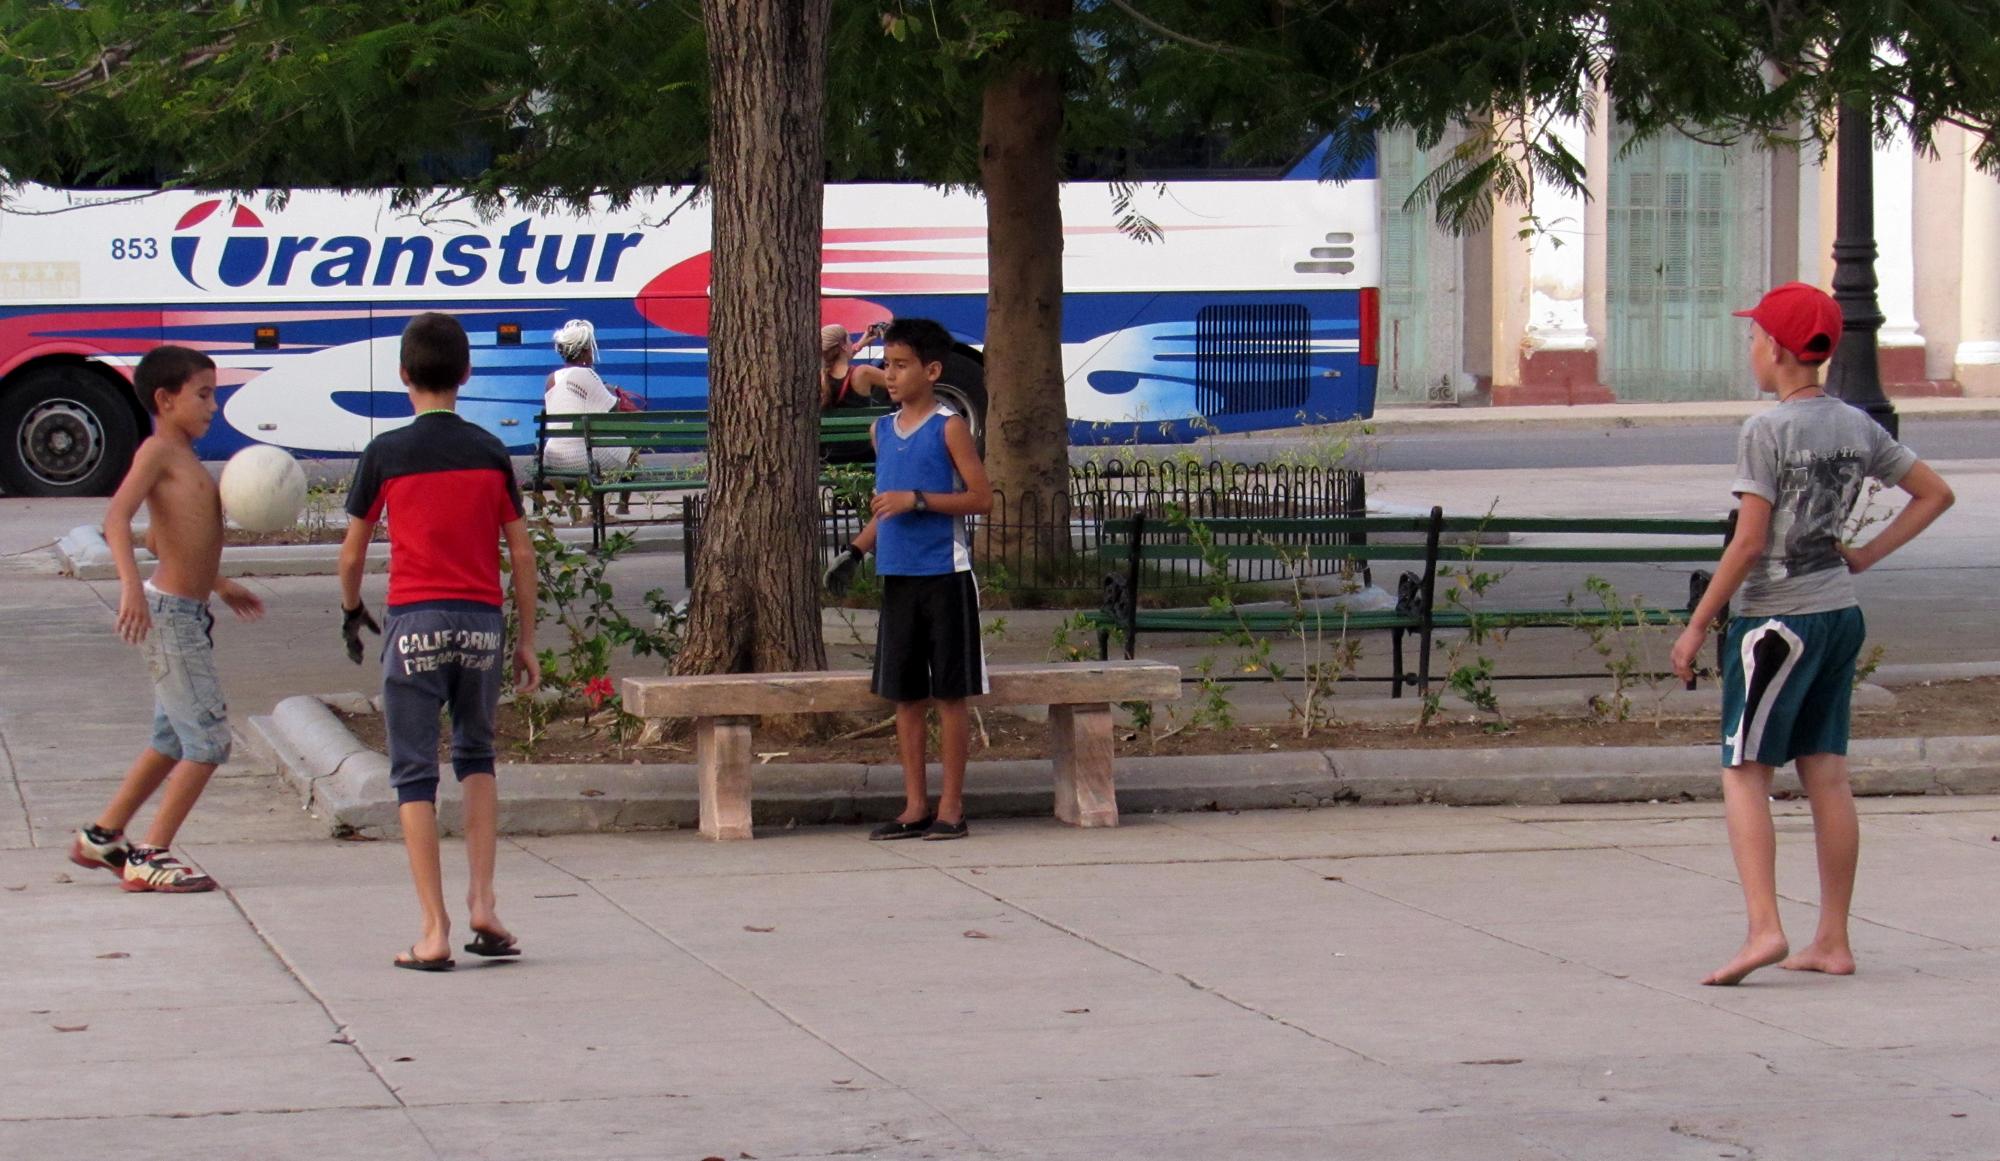 Children playing futbol in Cienfuegos